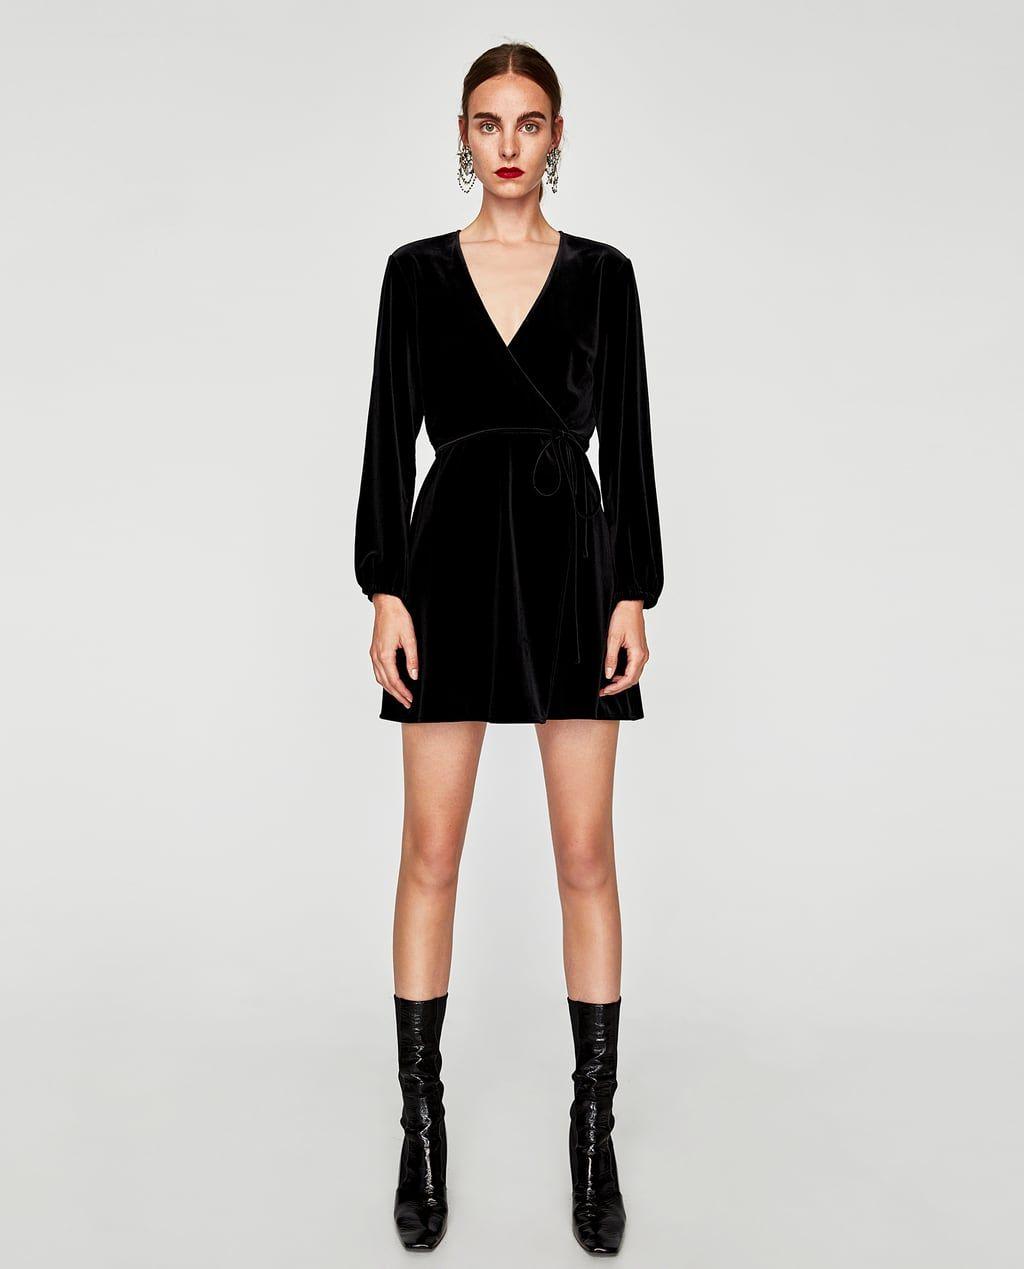 PareoΌ Να Αγοράσω τι Terciopelo Θέλω Women's Mini Vestido uc13Tl5JFK